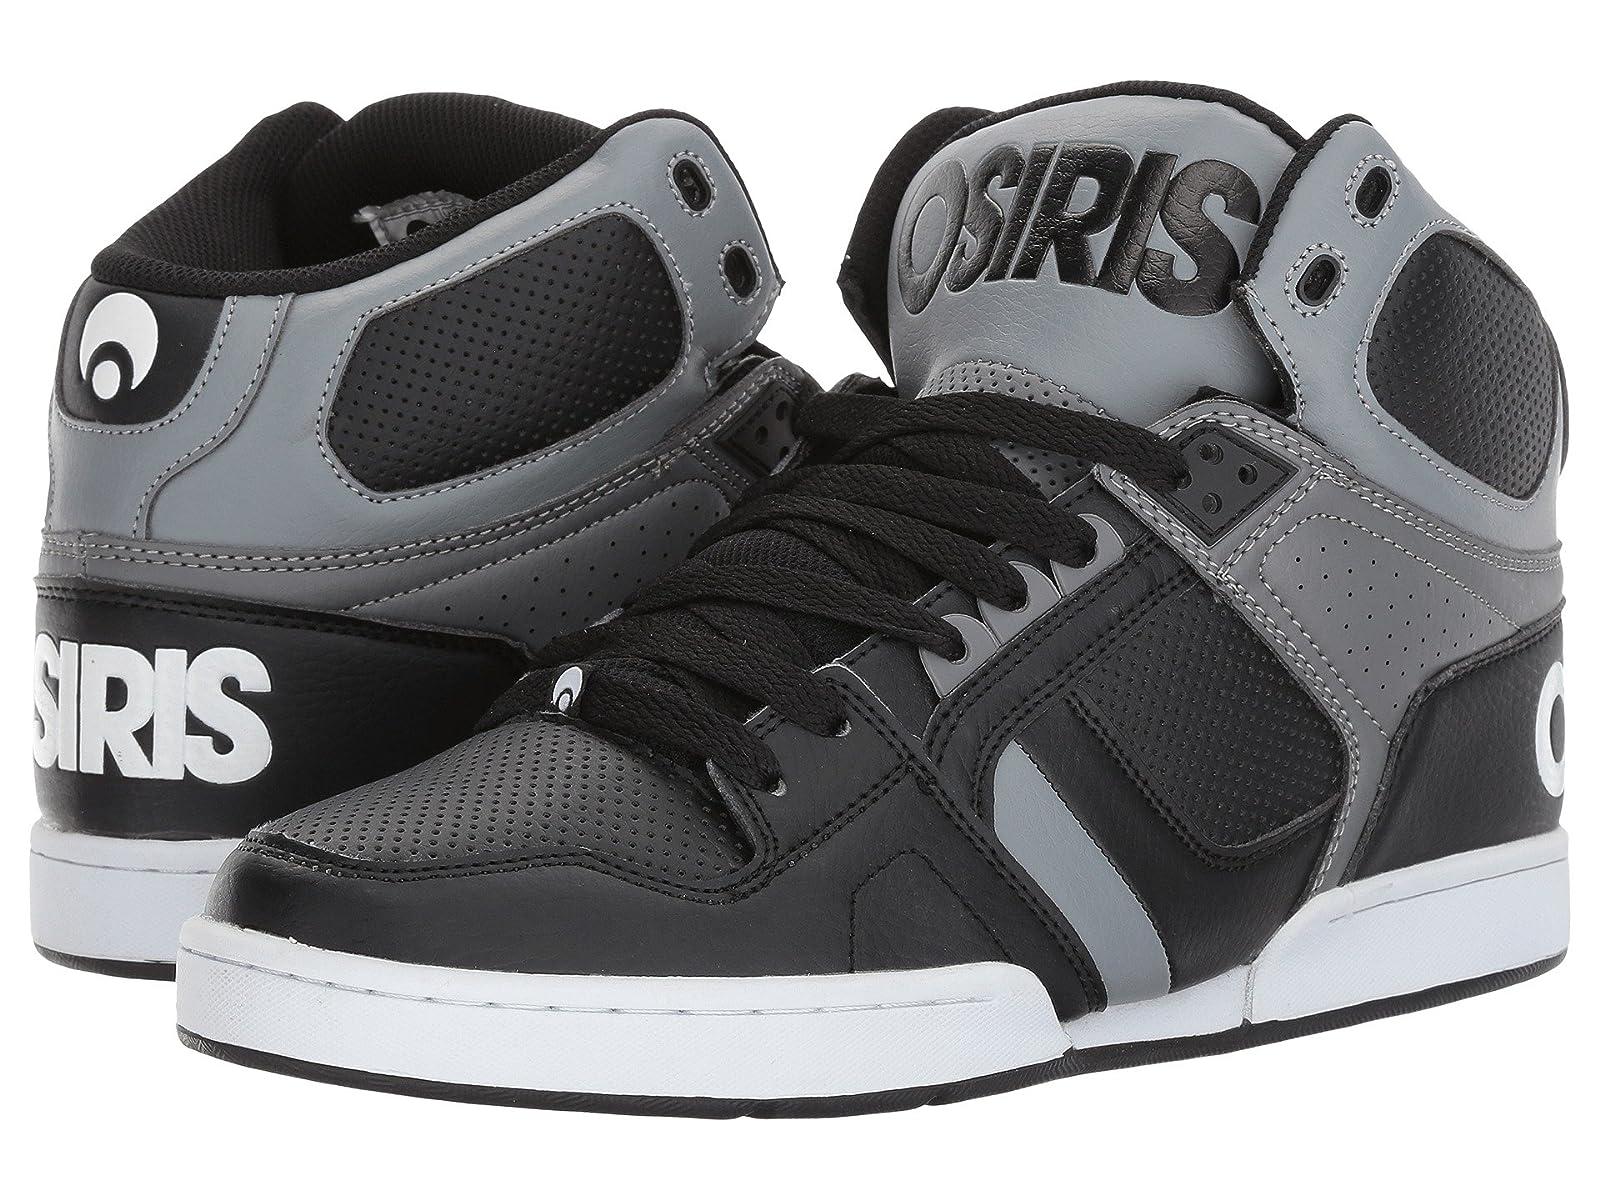 Osiris NYC83Cheap and distinctive eye-catching shoes